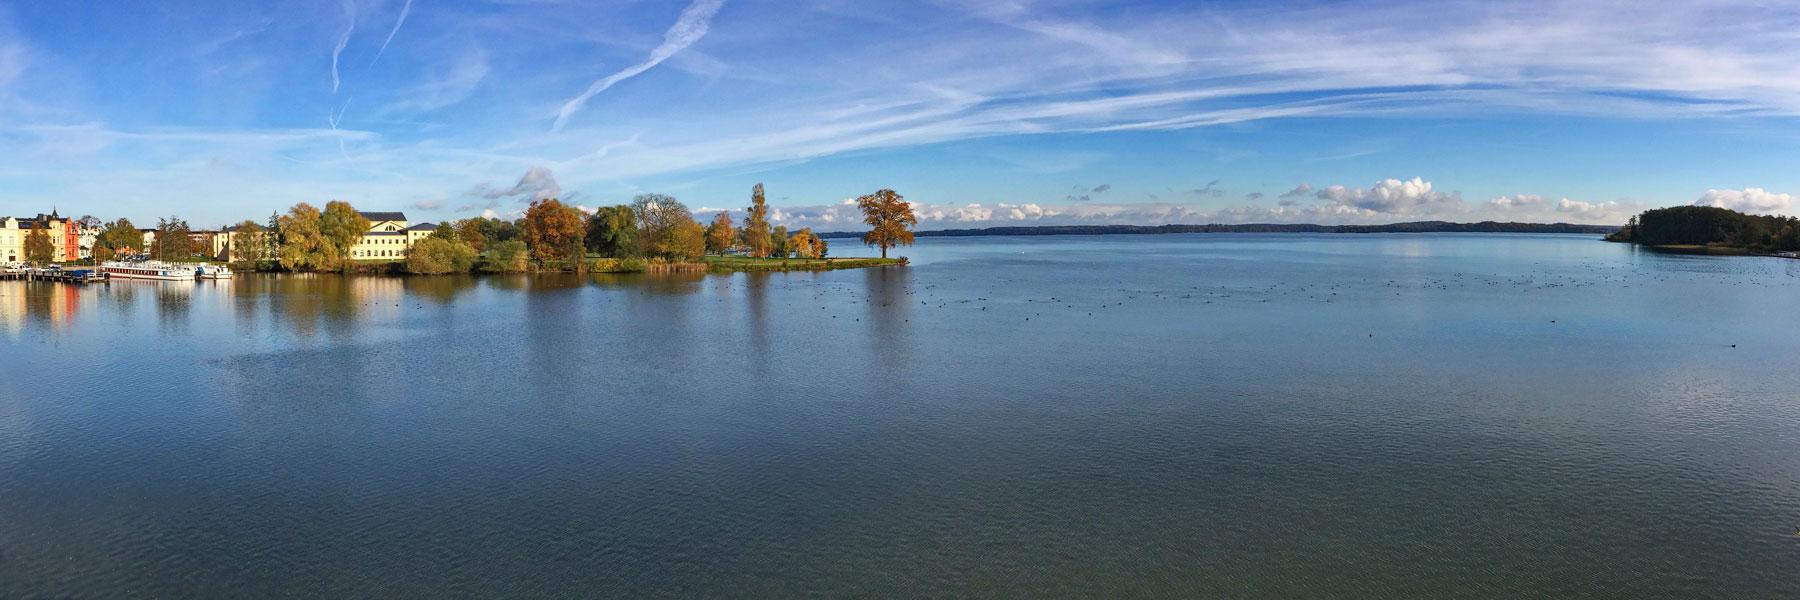 Schweriner See - Schwerin